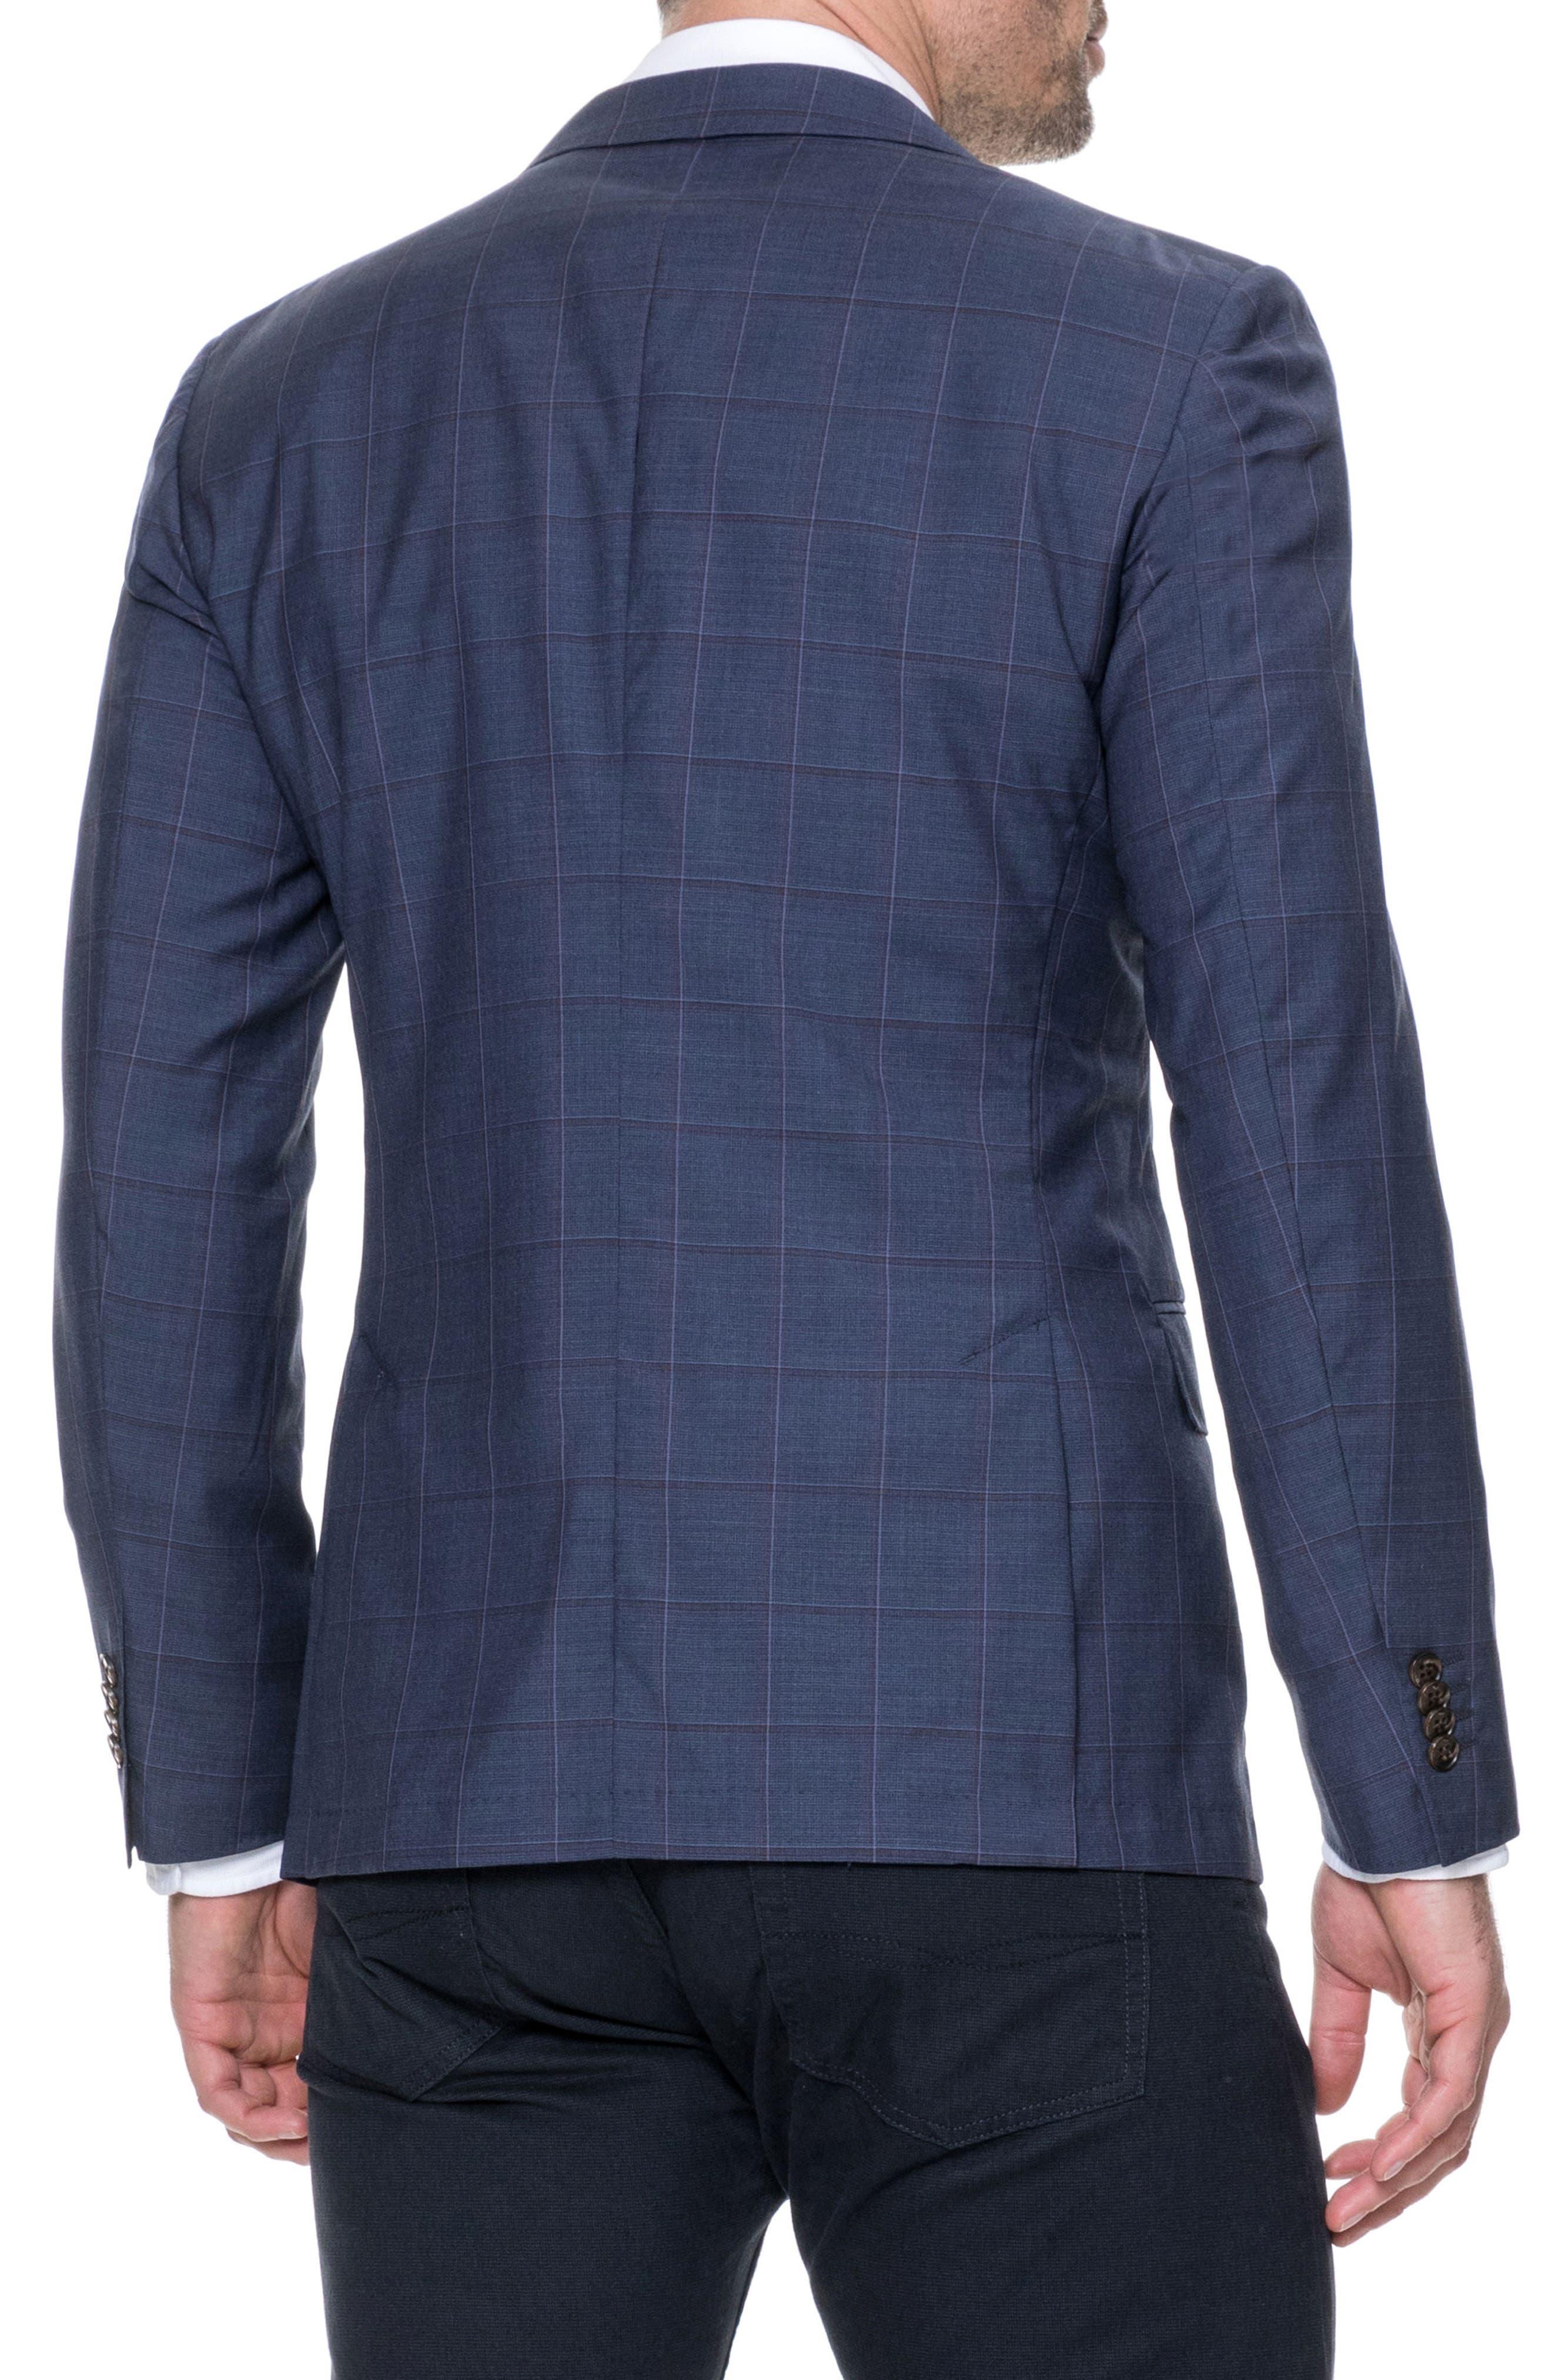 Luxbridge Regular Fit Wool Sport Coat,                             Alternate thumbnail 2, color,                             Midnight